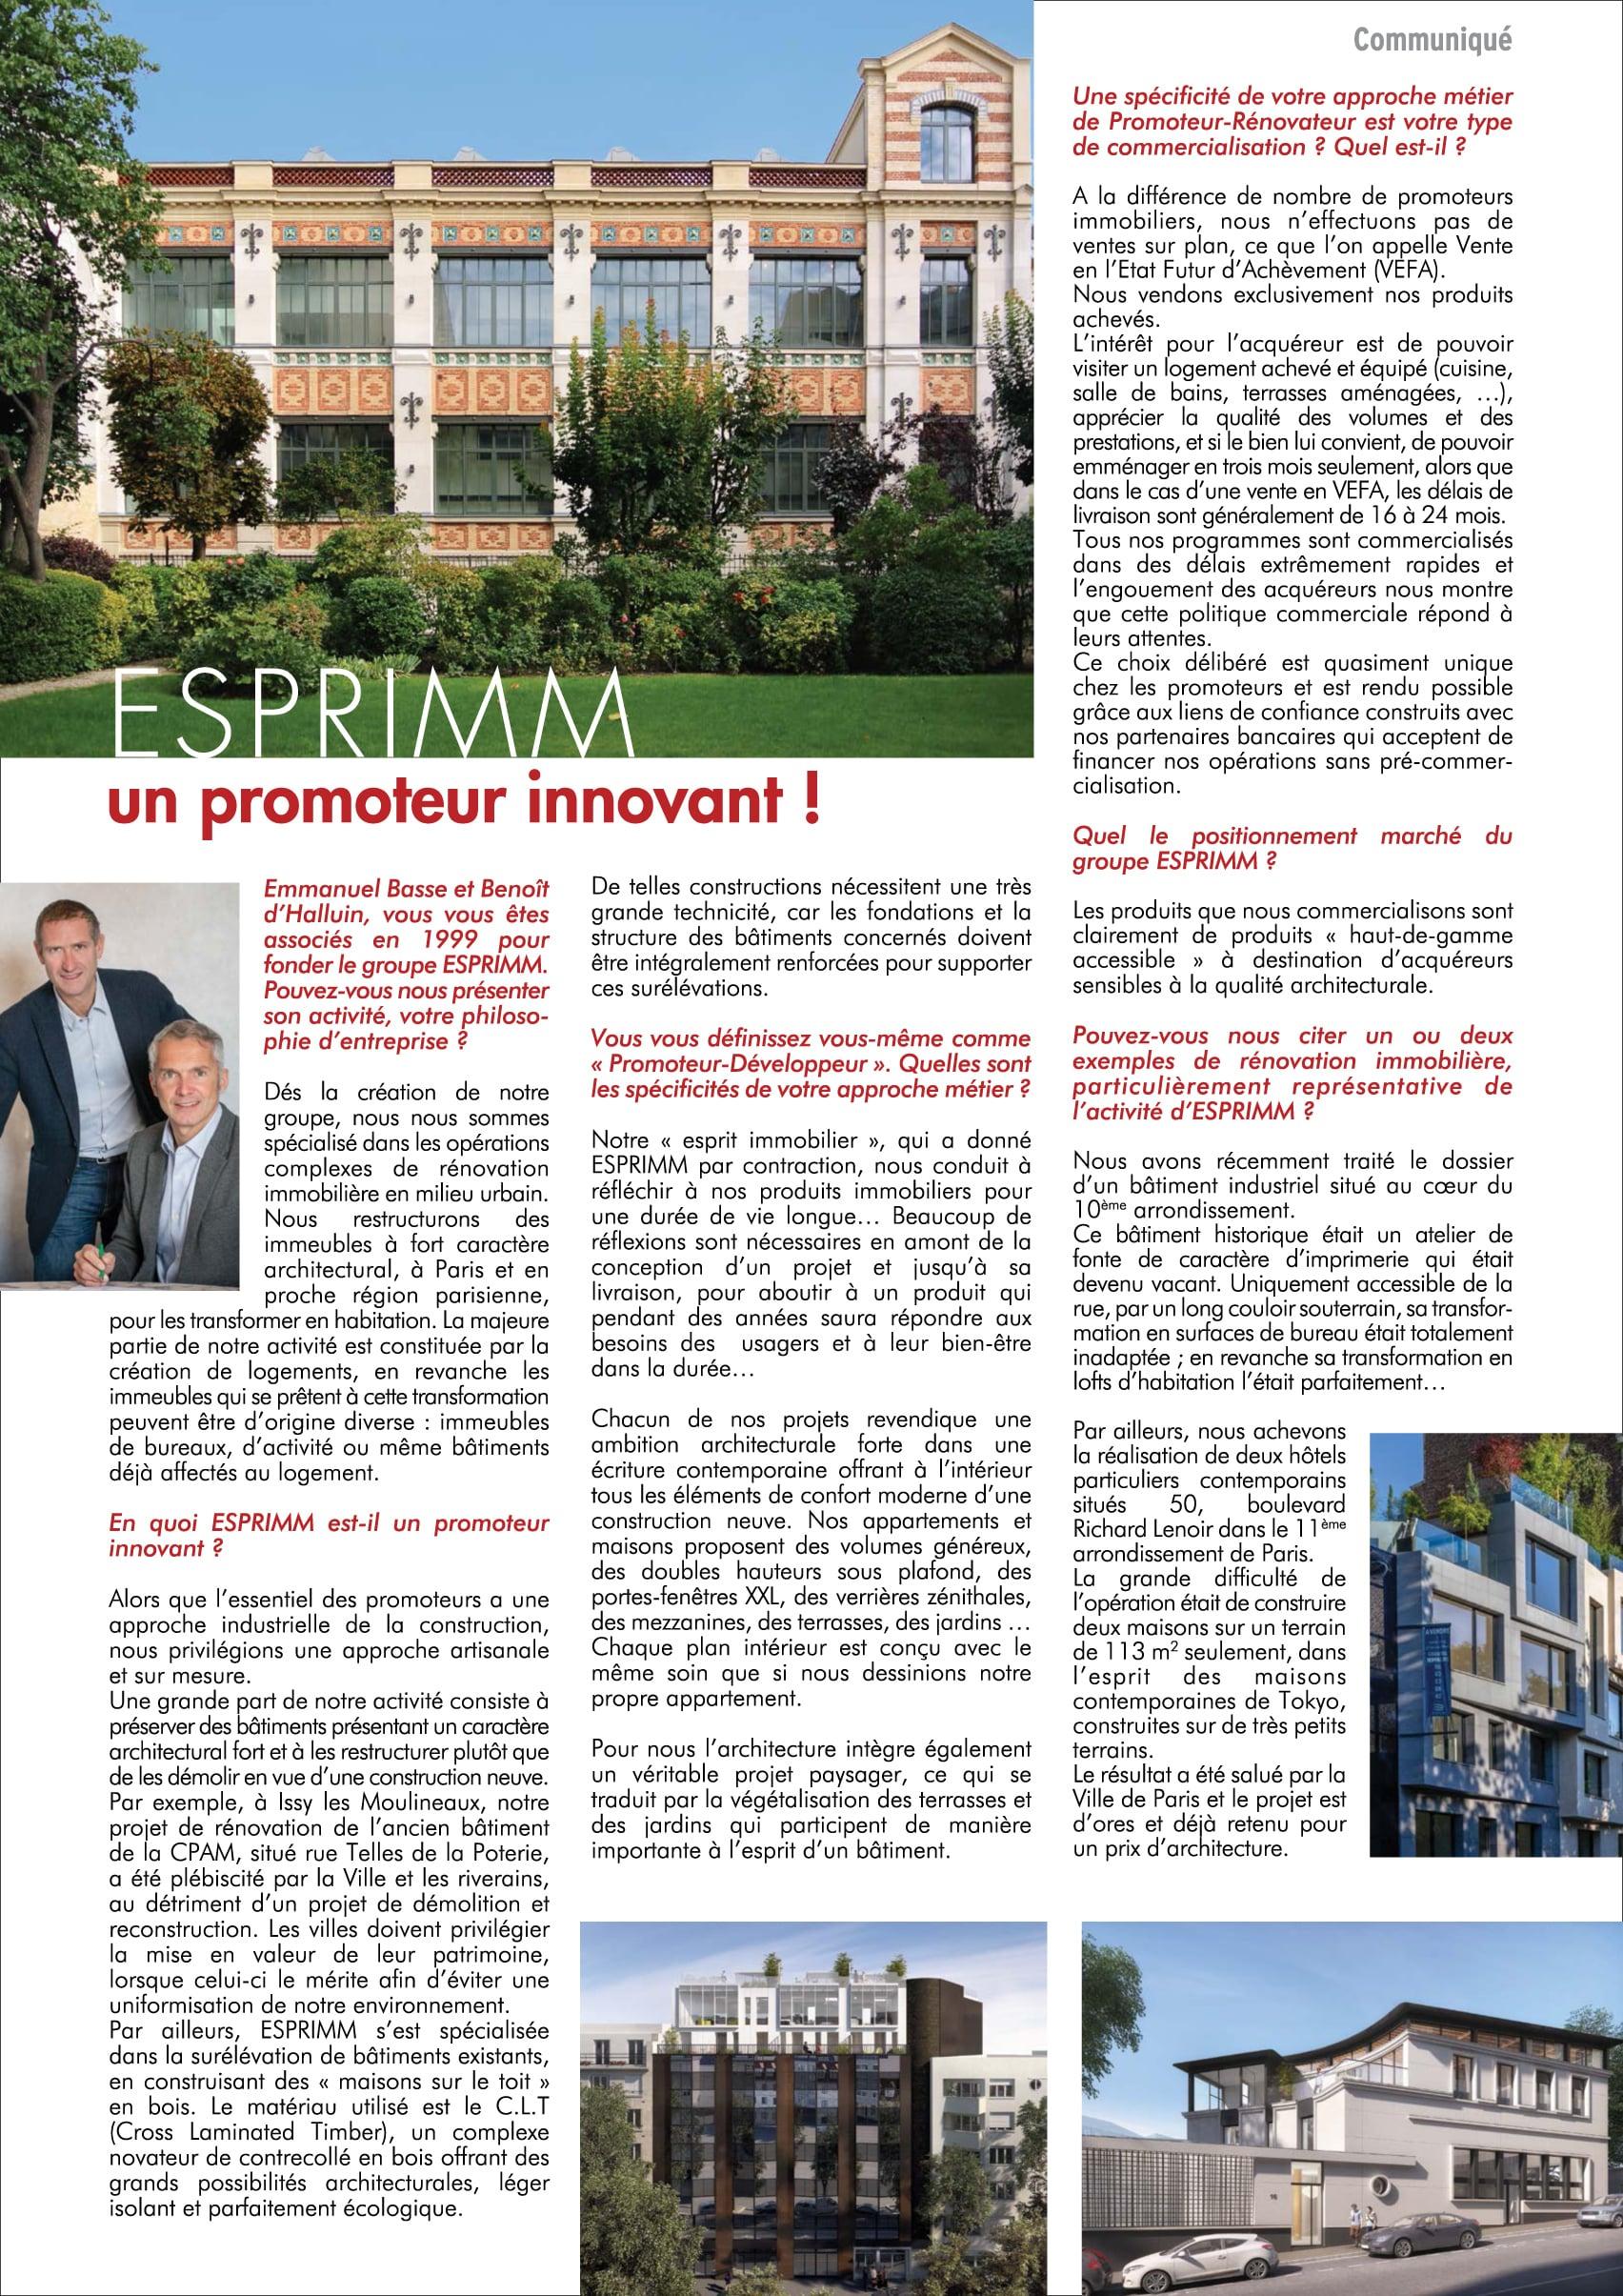 Dialogues 92 - Magazine - Novembre 2015 - article Esprimm